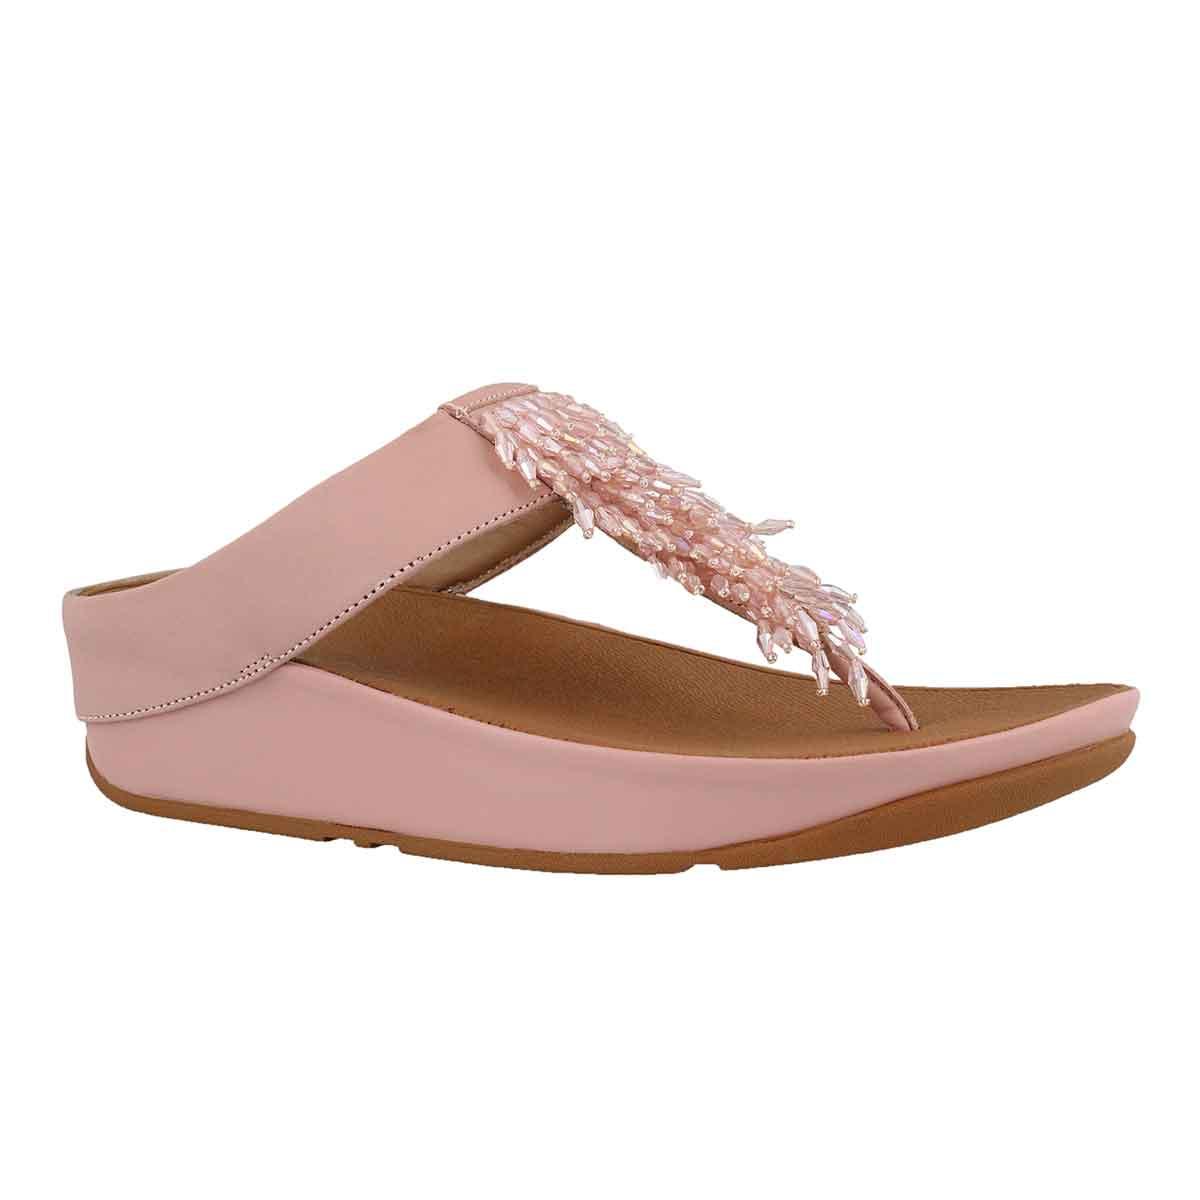 Women's RUMBA dusky pink fringe thong sandal